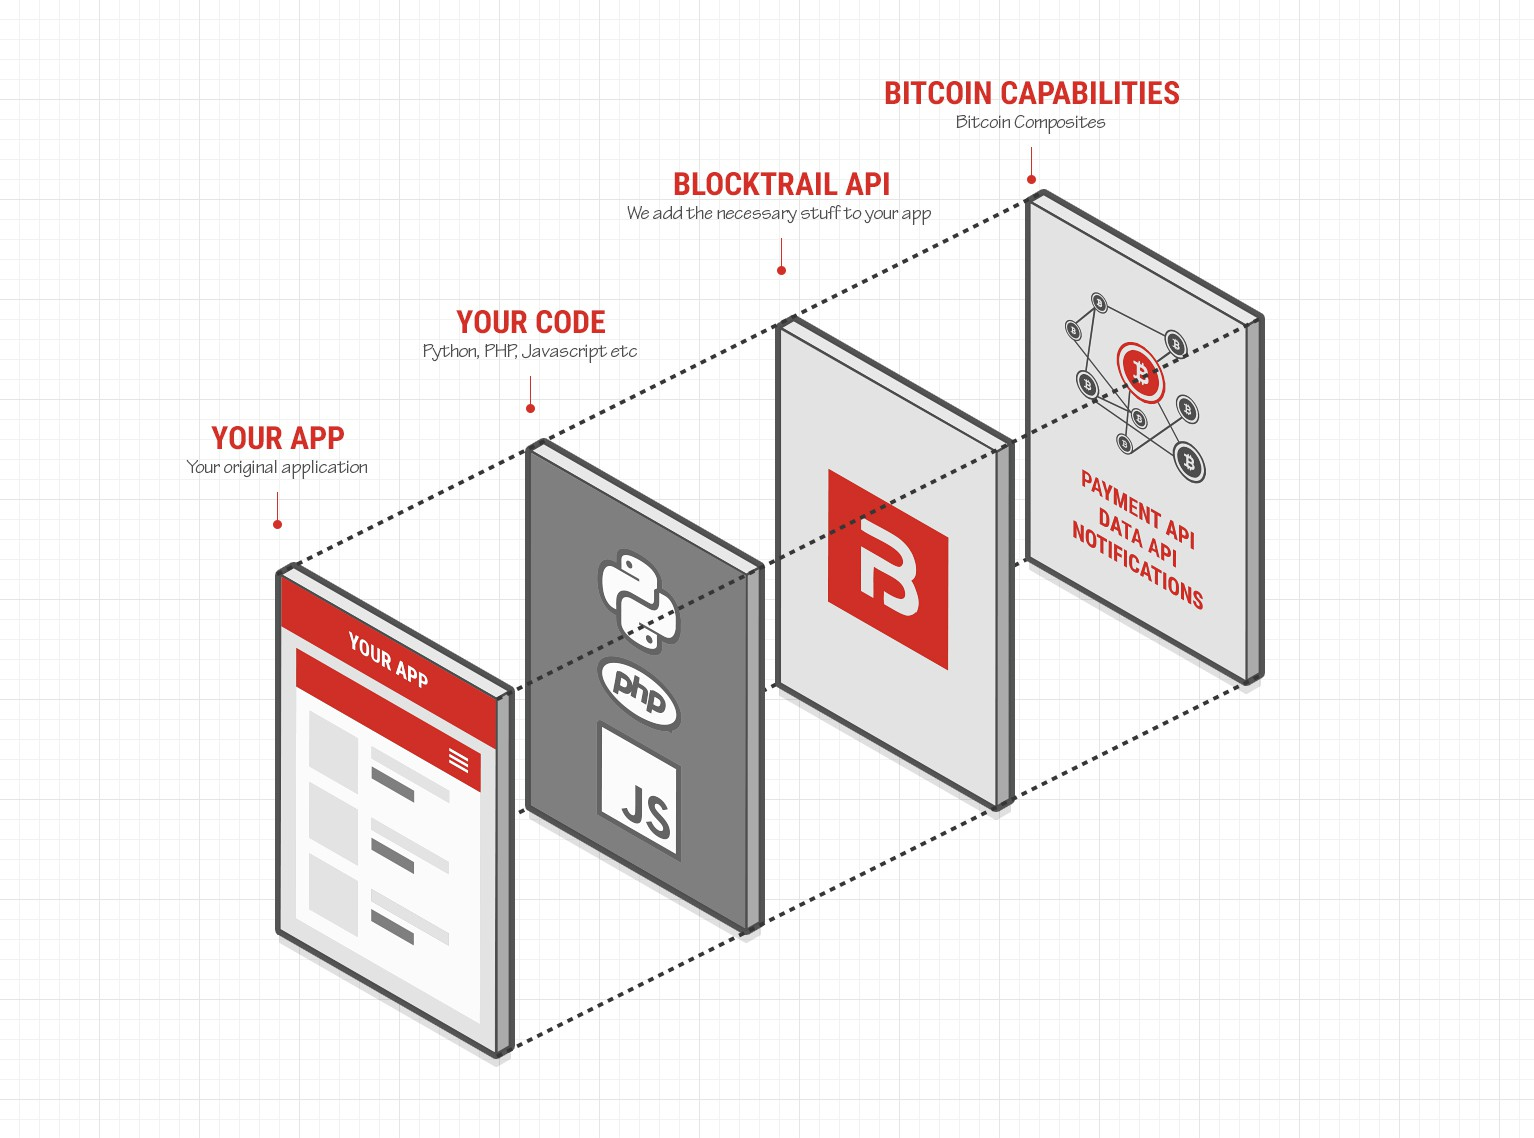 Create visualizations for a Bitcoin API